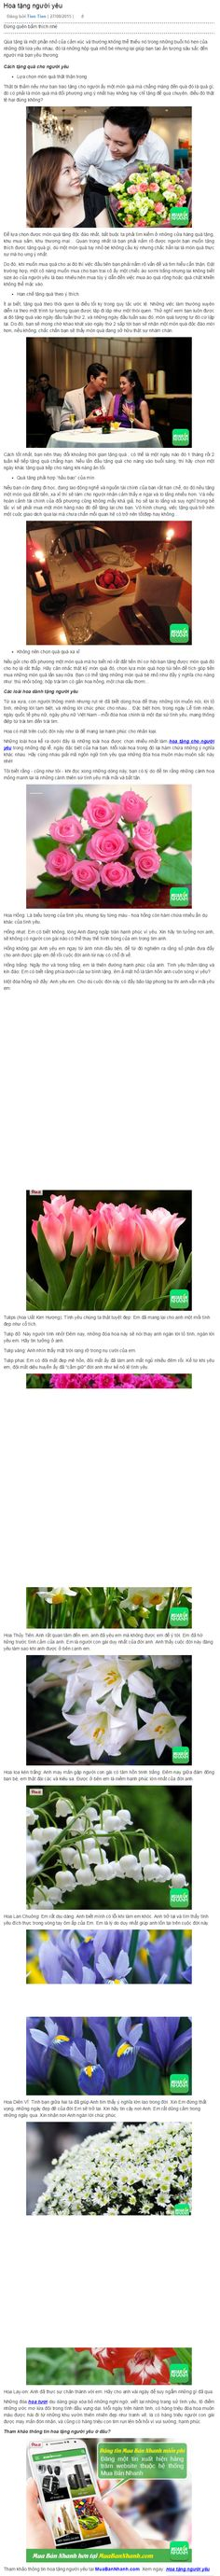 Hoa tặng người yêu https://muabannhanh.com/tag/hoa-tang-nguoi-yeu